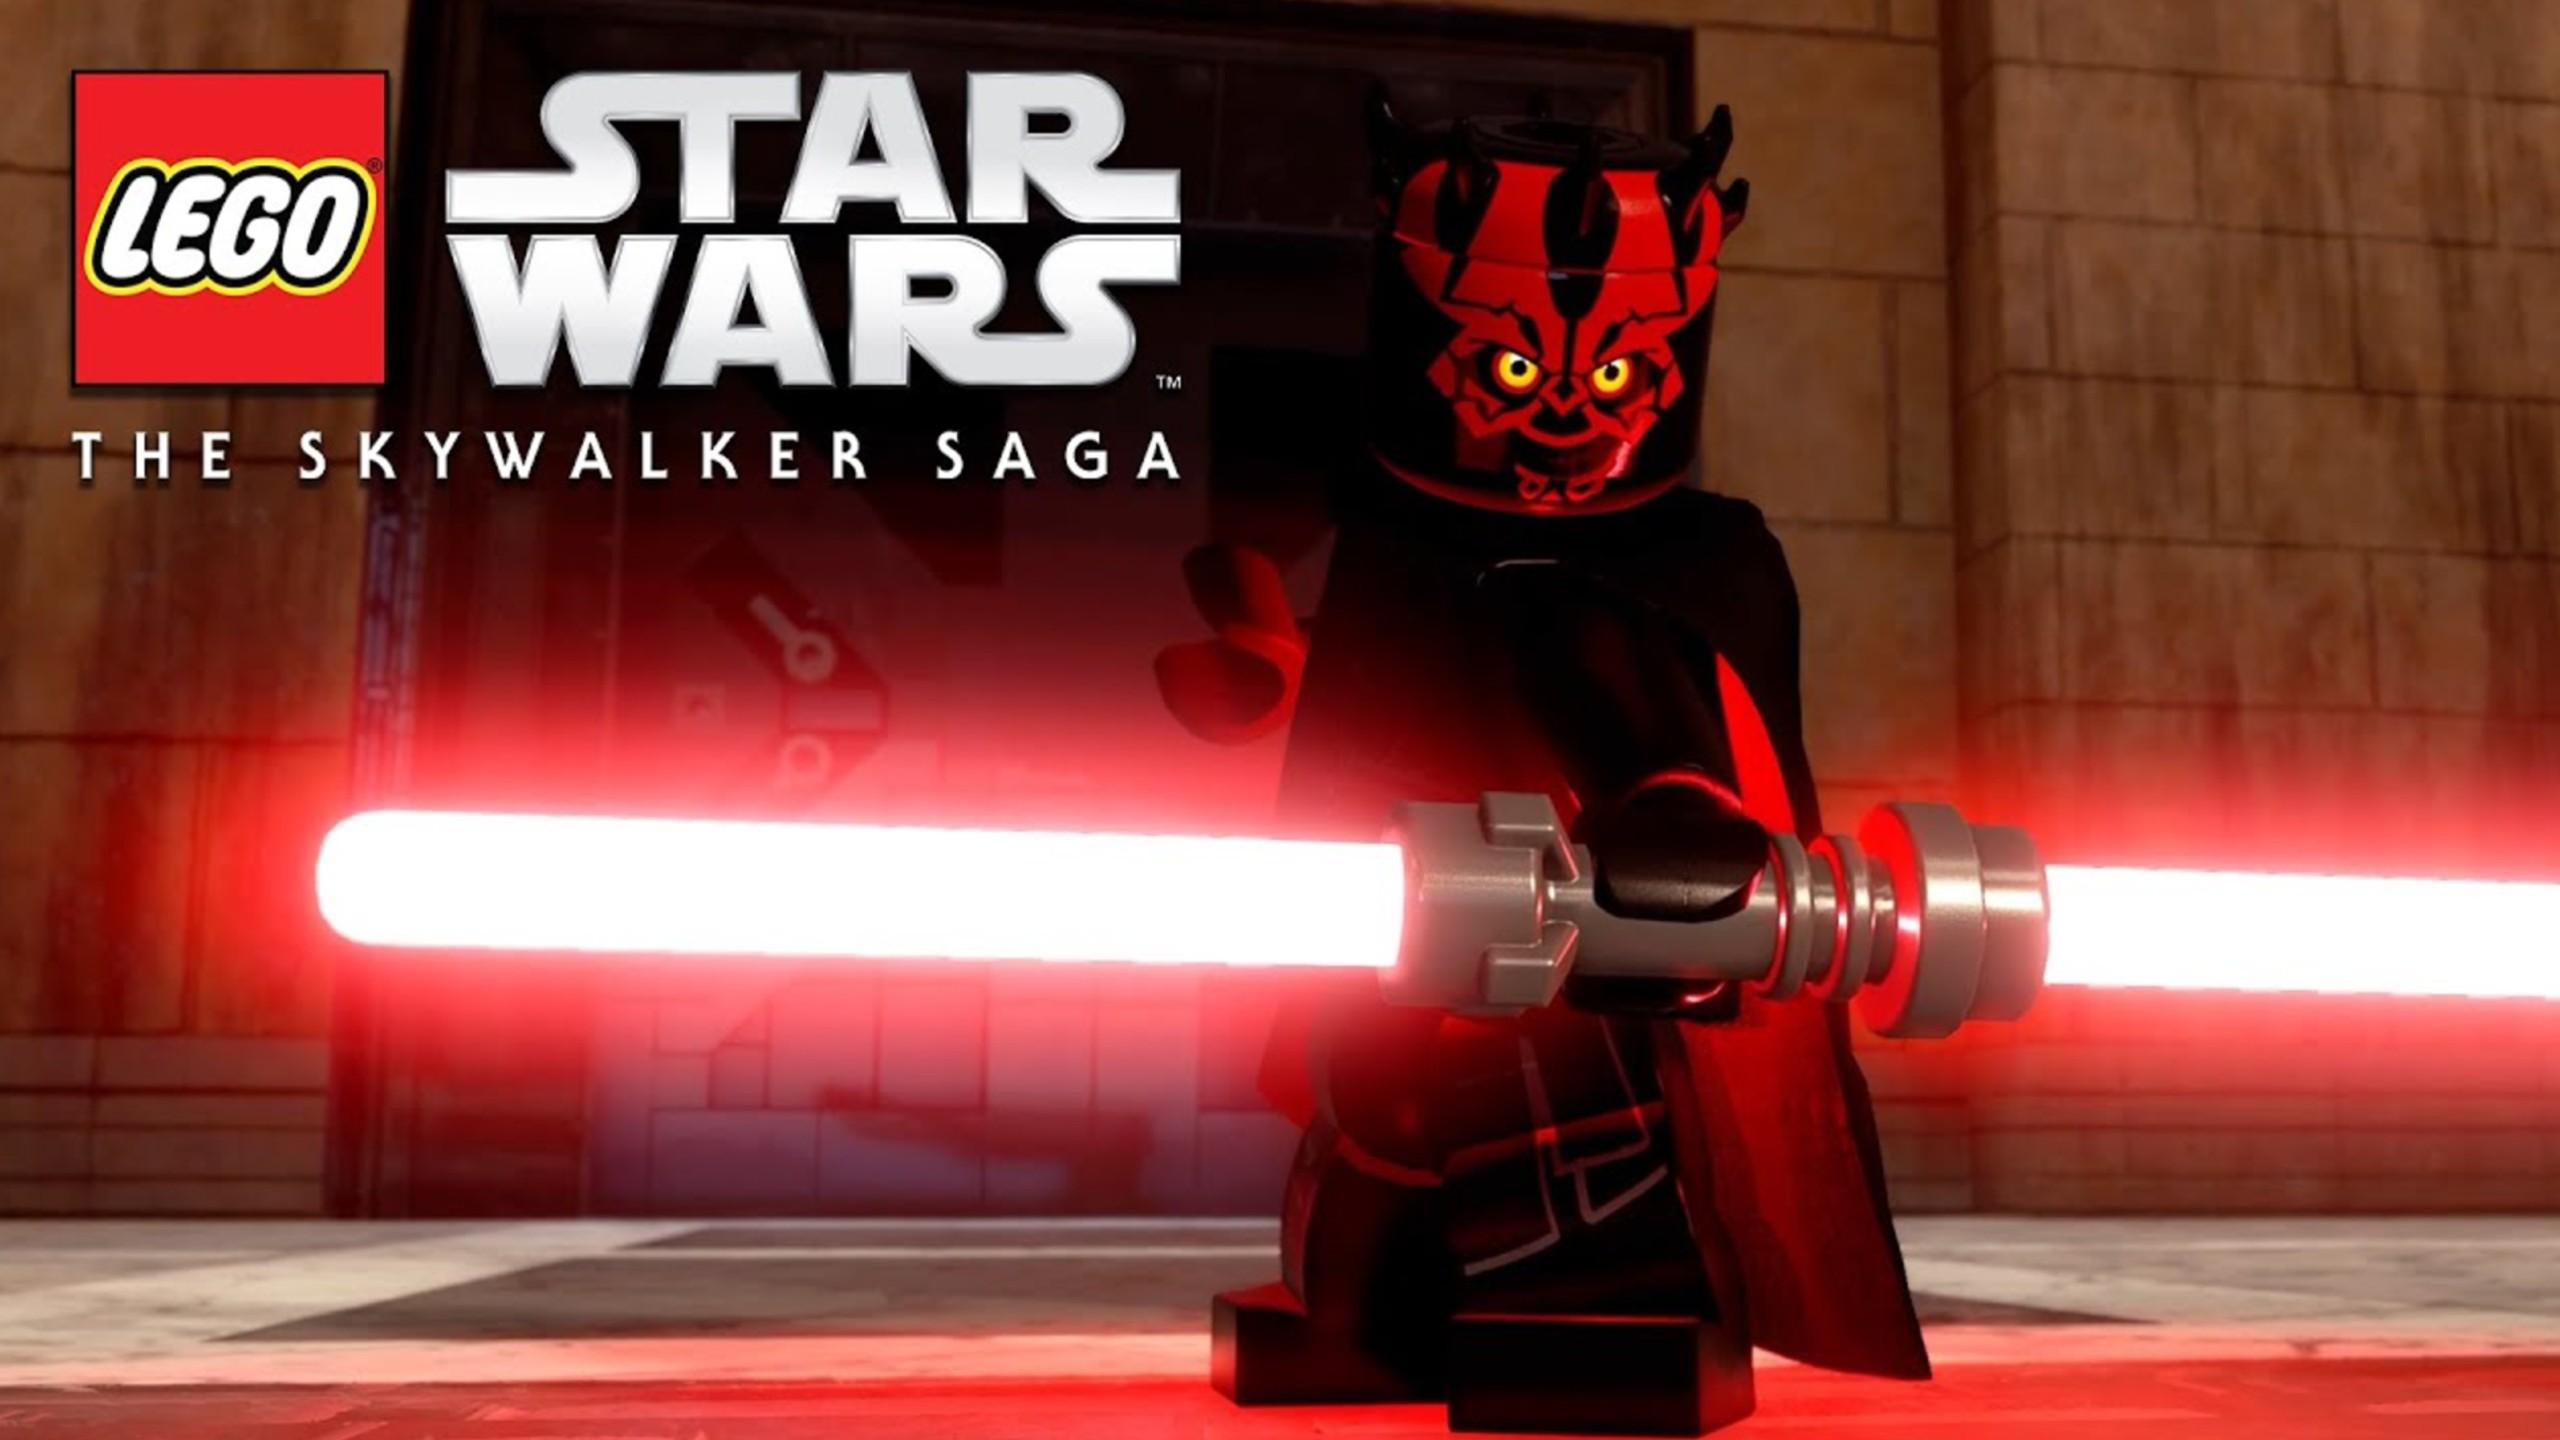 Lego Star Wars Skywalker Saga